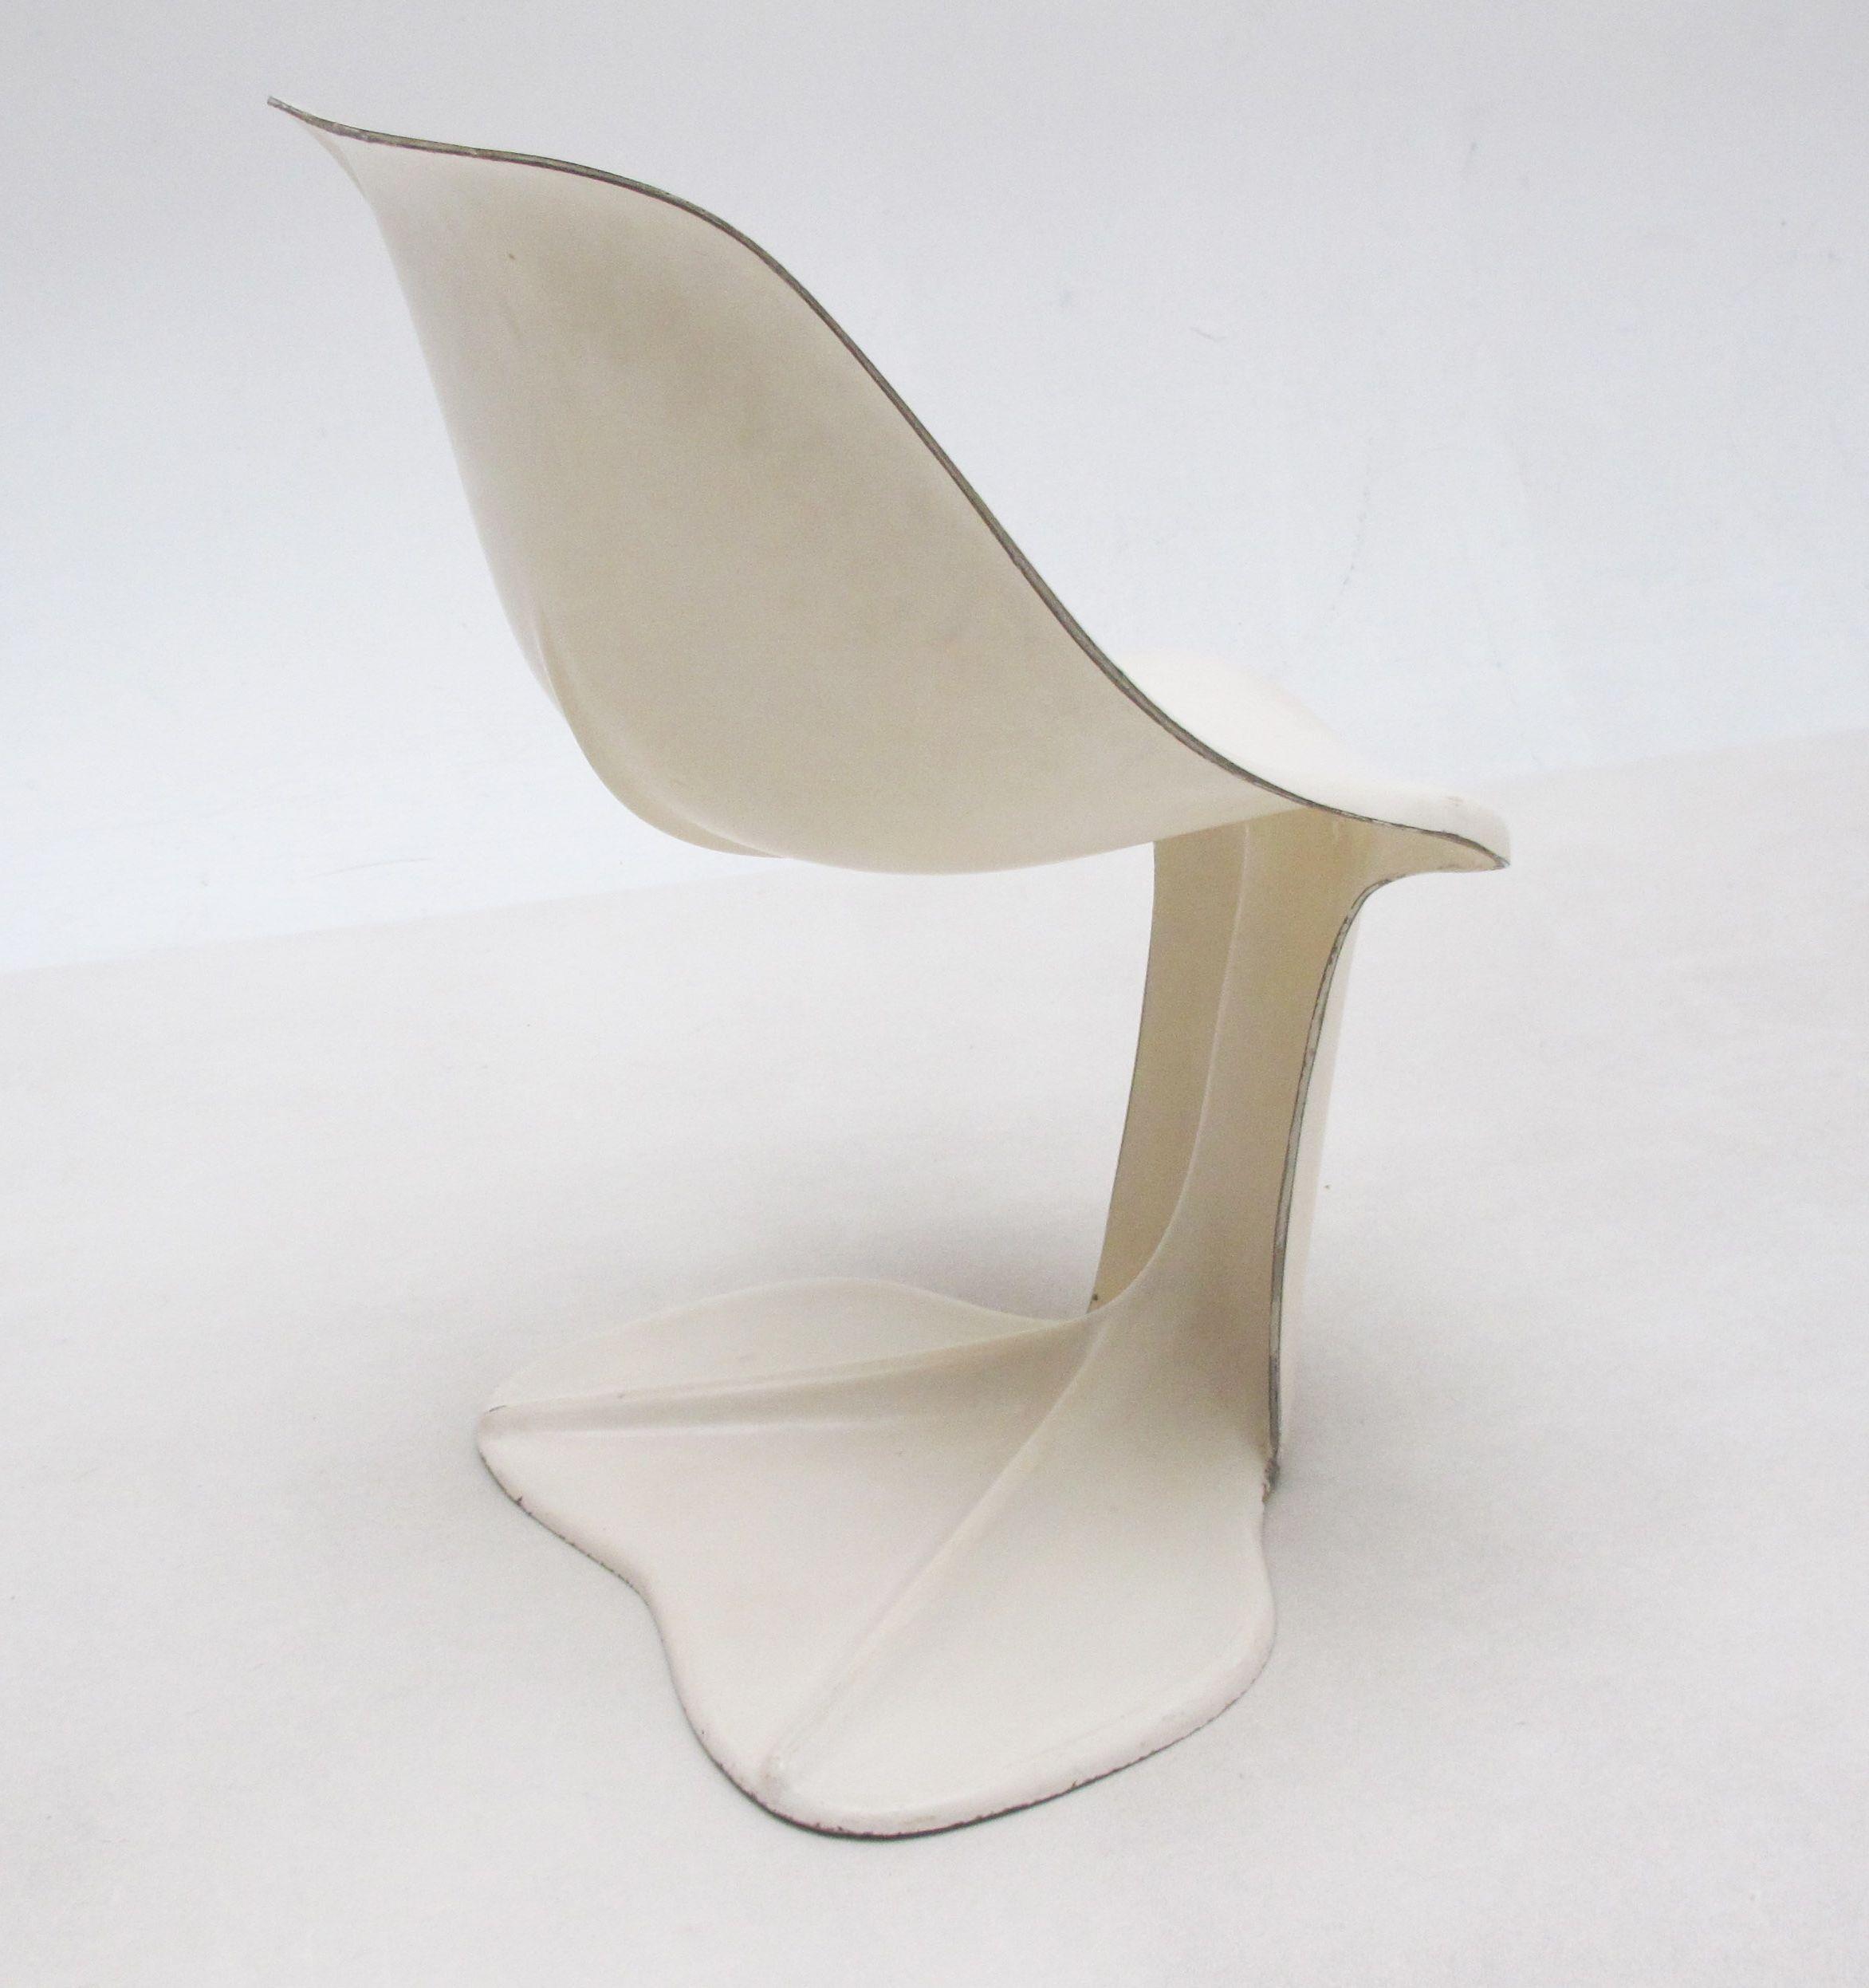 Jean Dudon Molded Fiberglass Chair 1970 Maison